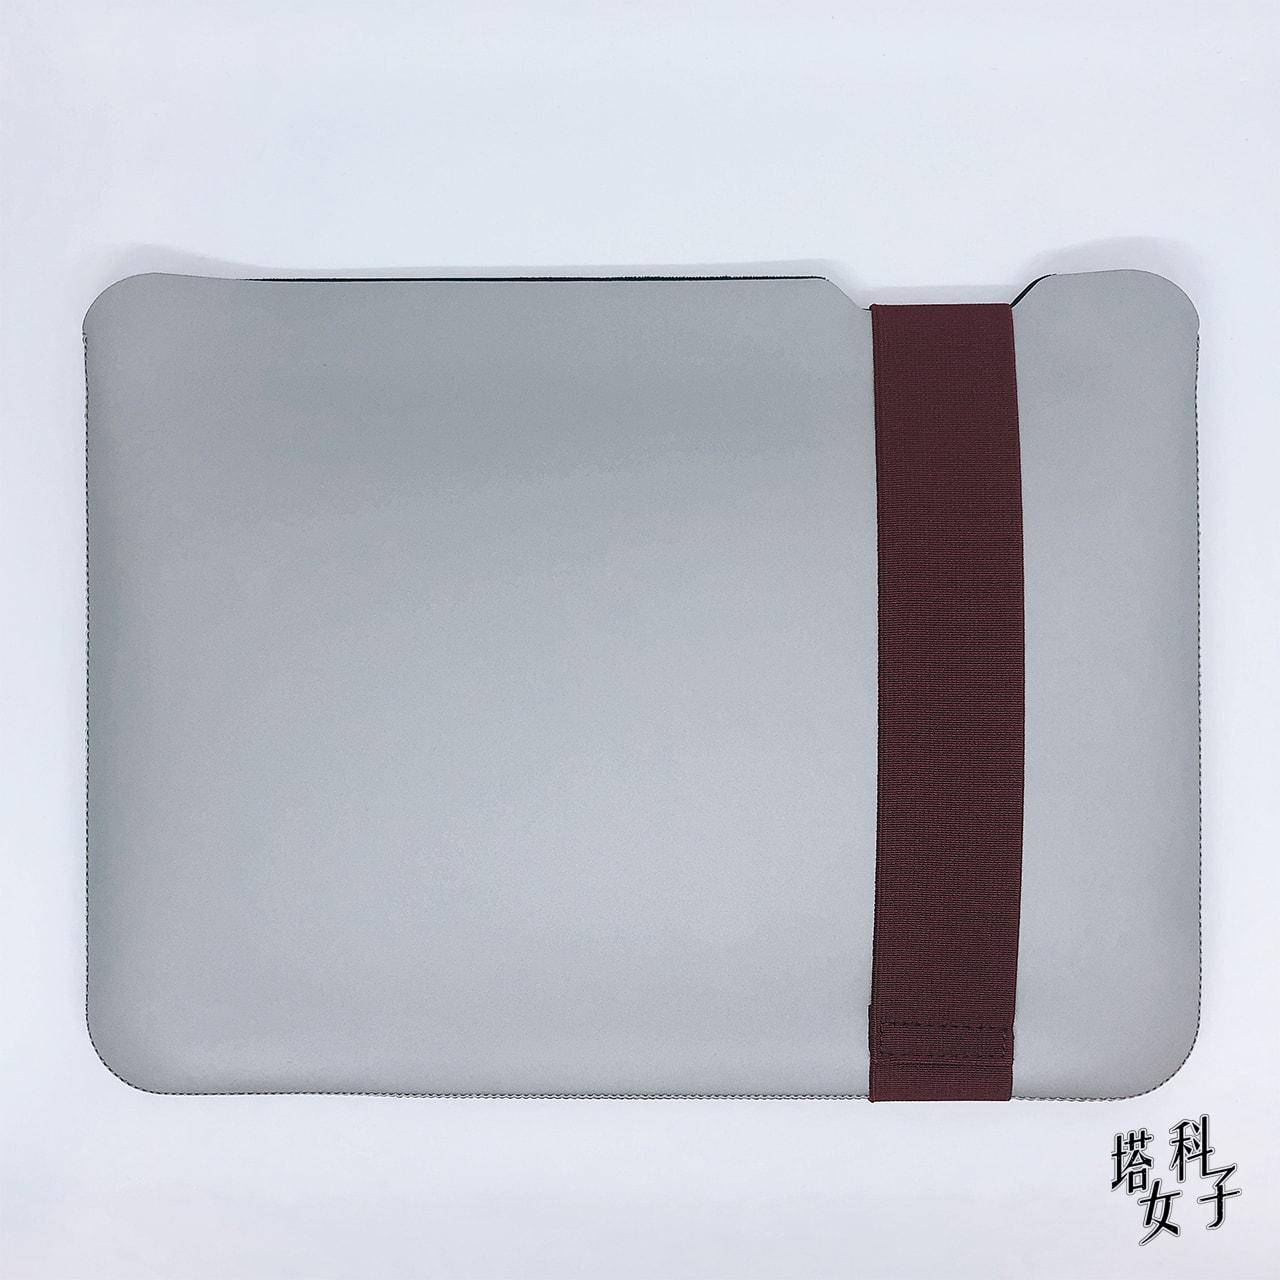 Acme Made - Skinny Sleeve 背面